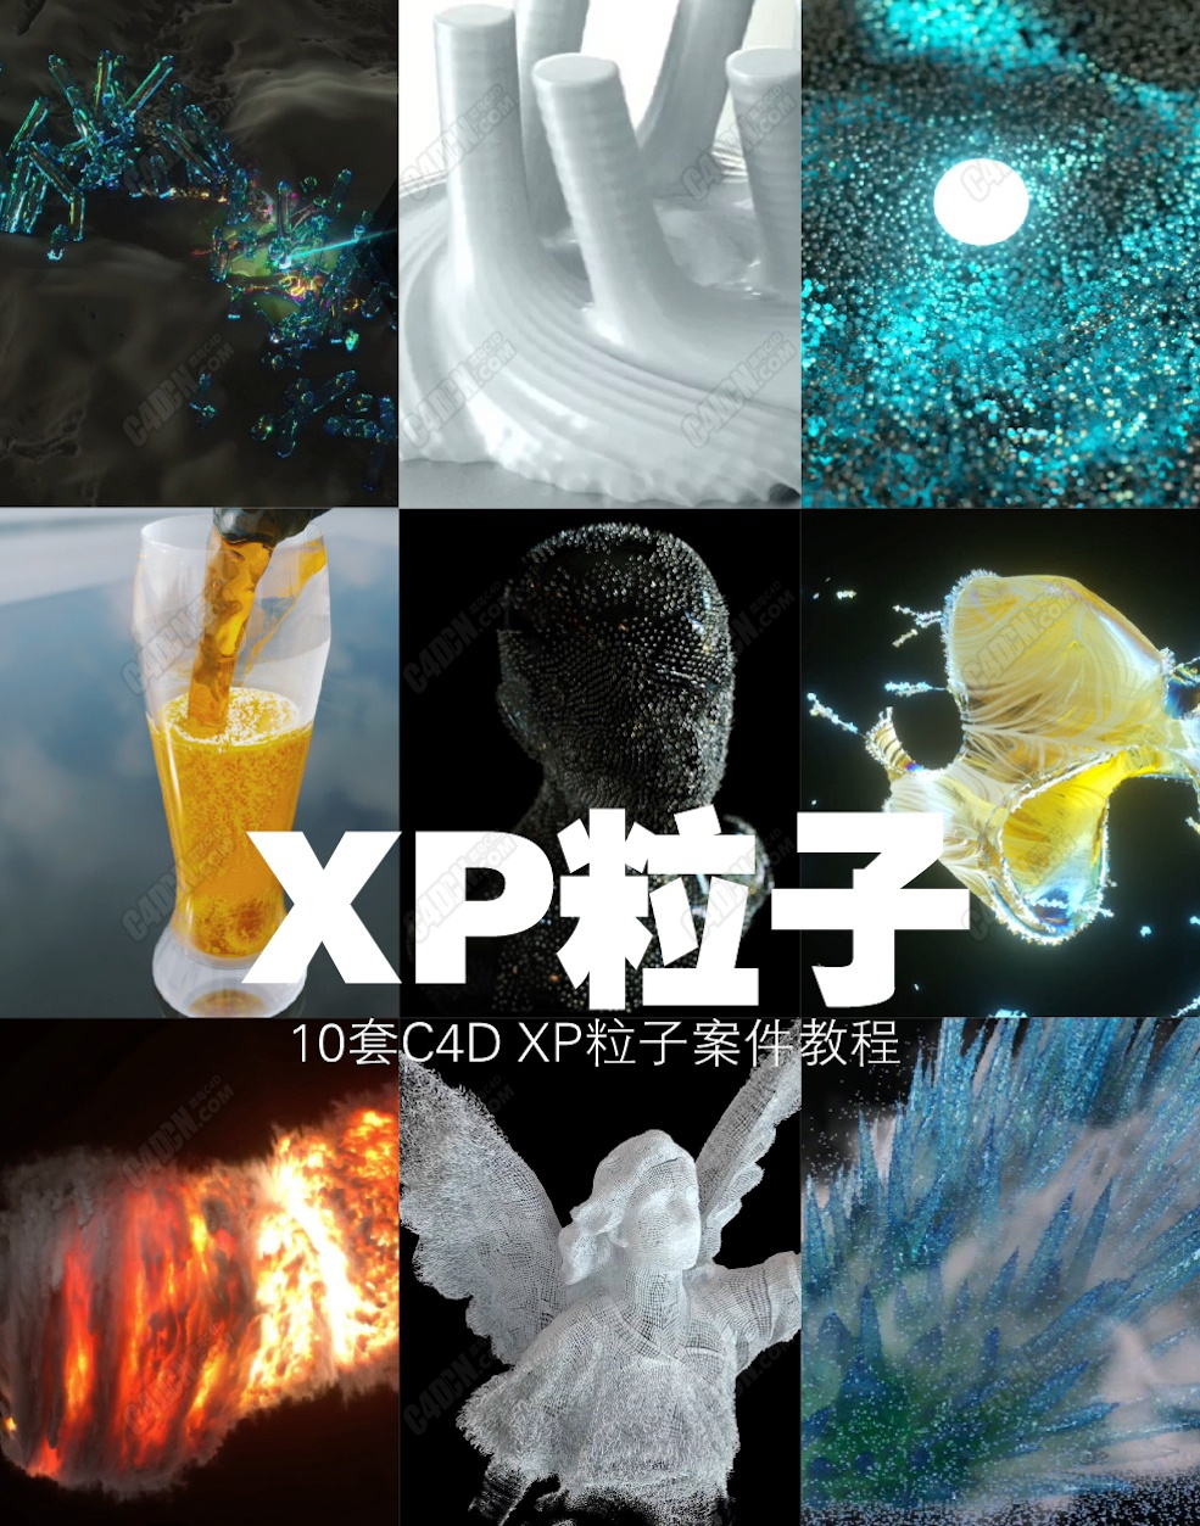 X-Particles粒子插件4.0版本全面進階中文案例視頻教程